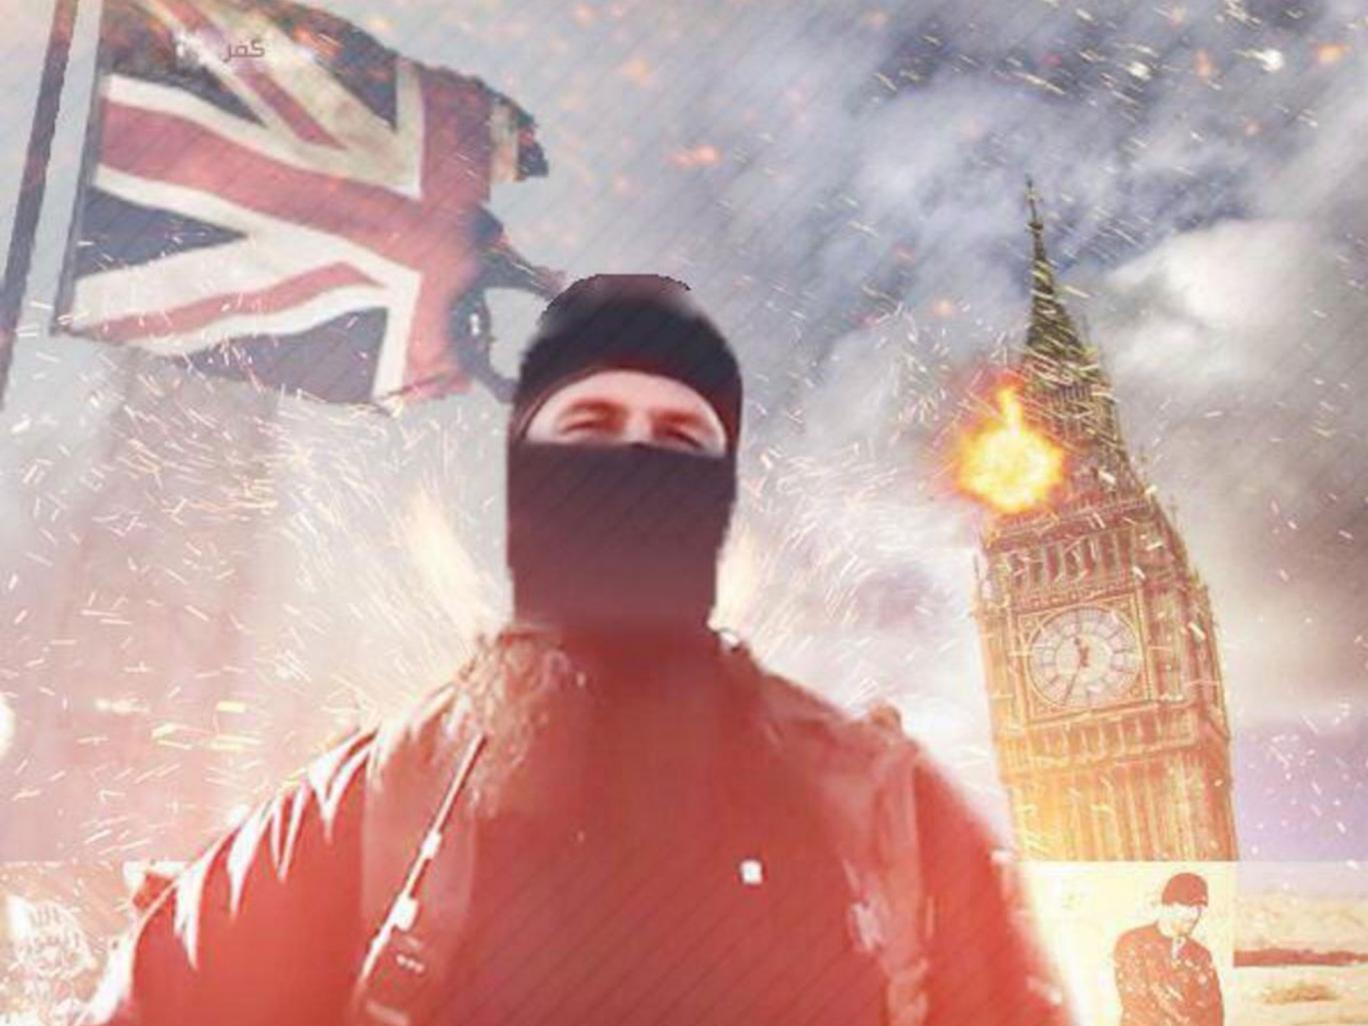 Isis video threatens terror attacks in London